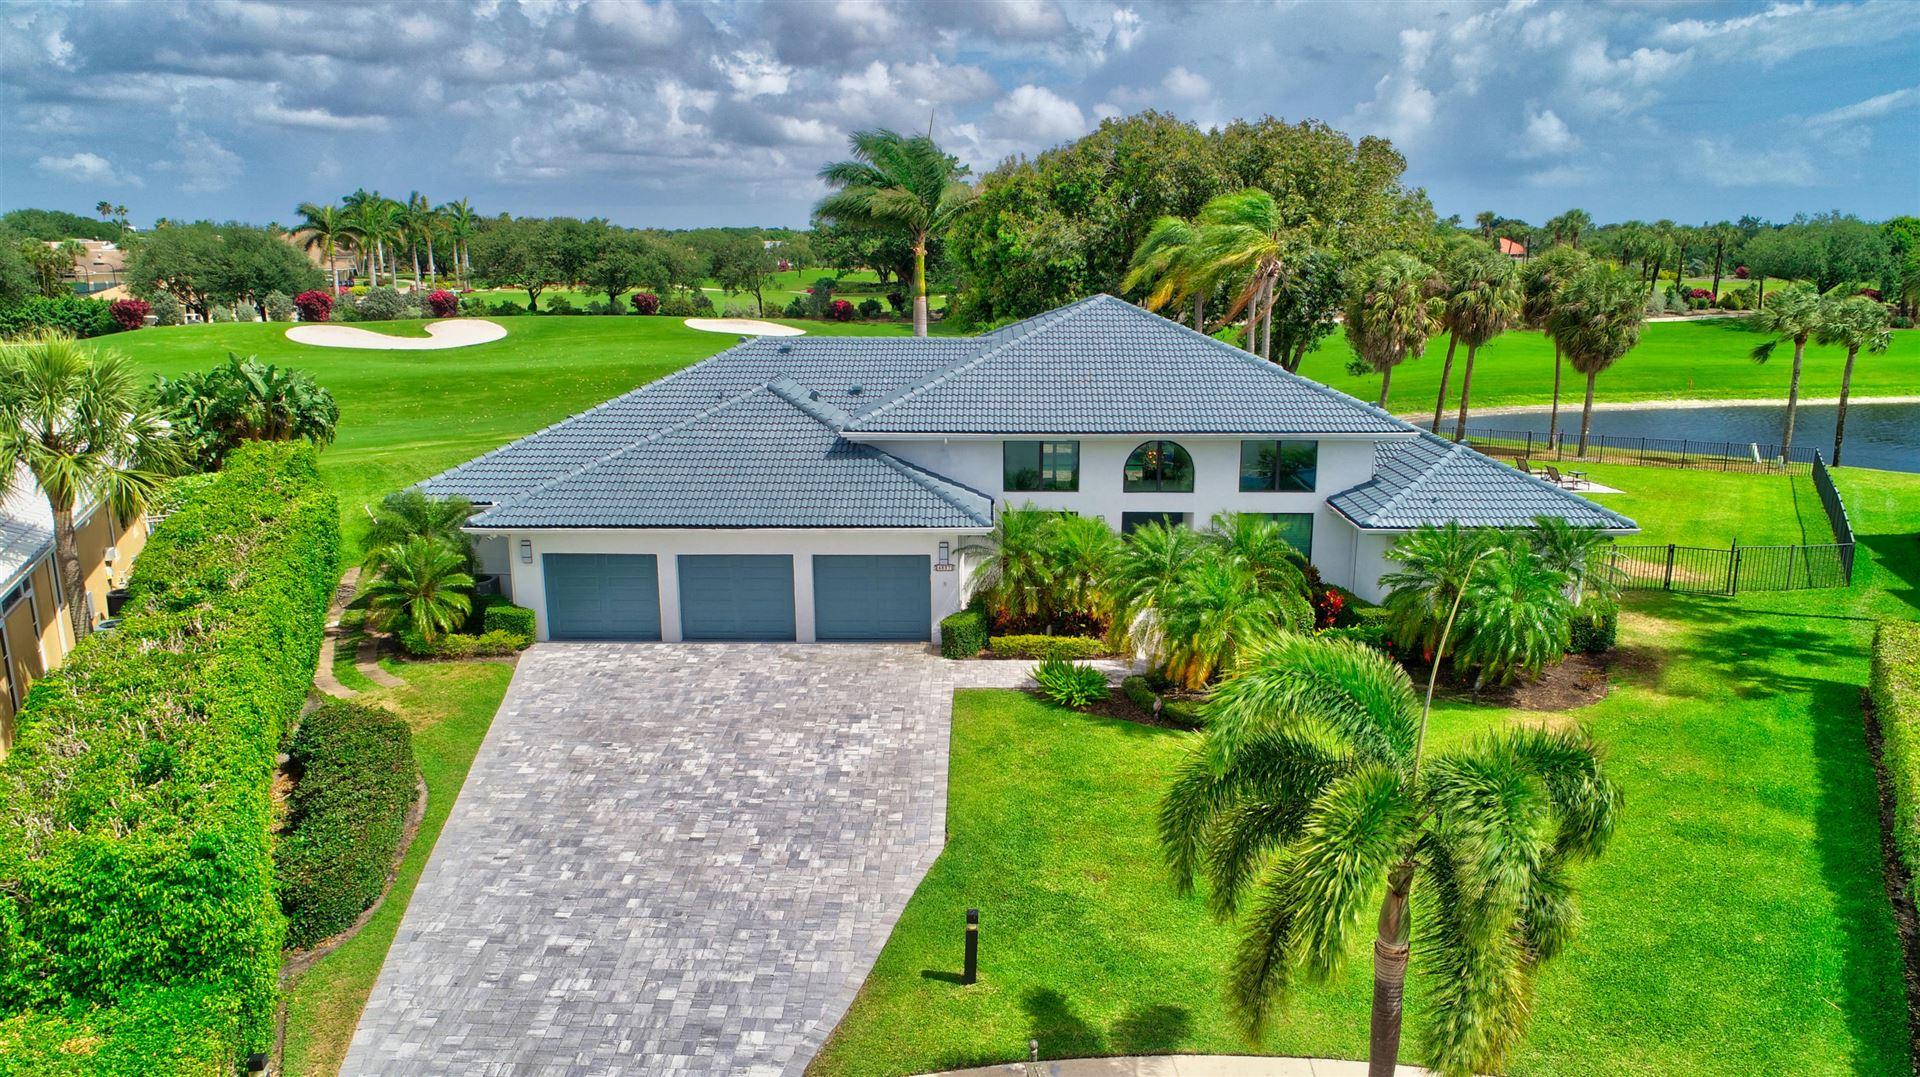 Photo of 4837 Tallowwood Lane, Boca Raton, FL 33487 (MLS # RX-10753700)